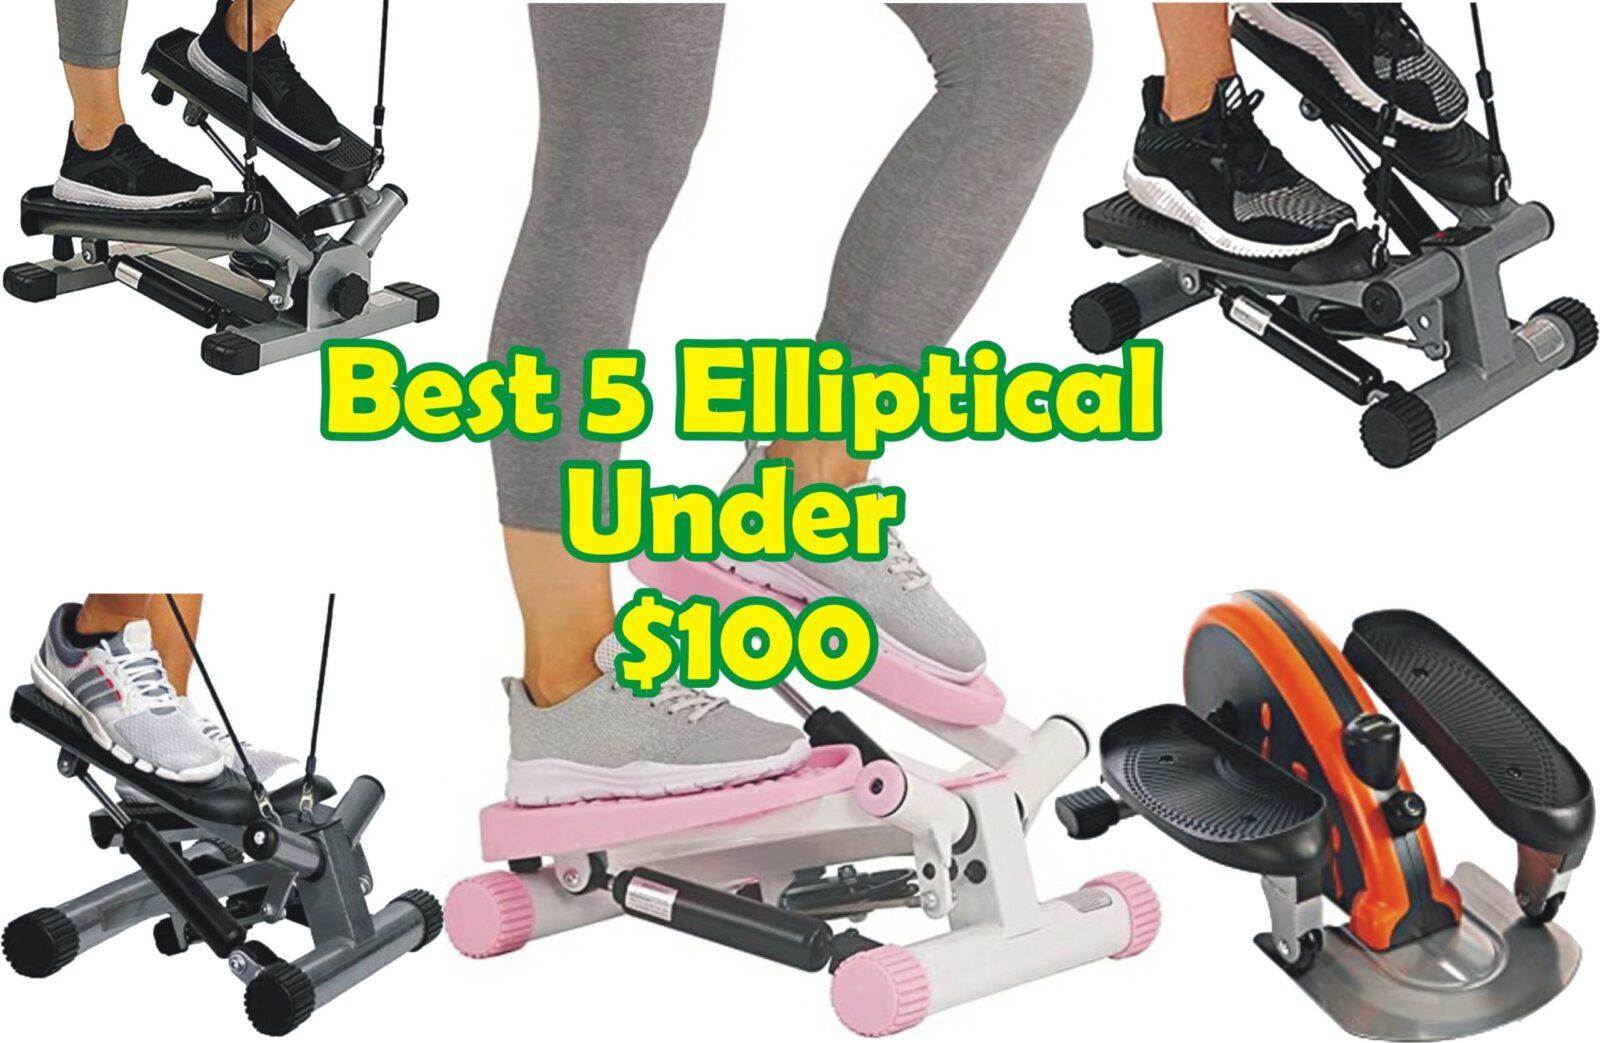 elliptical-under-100